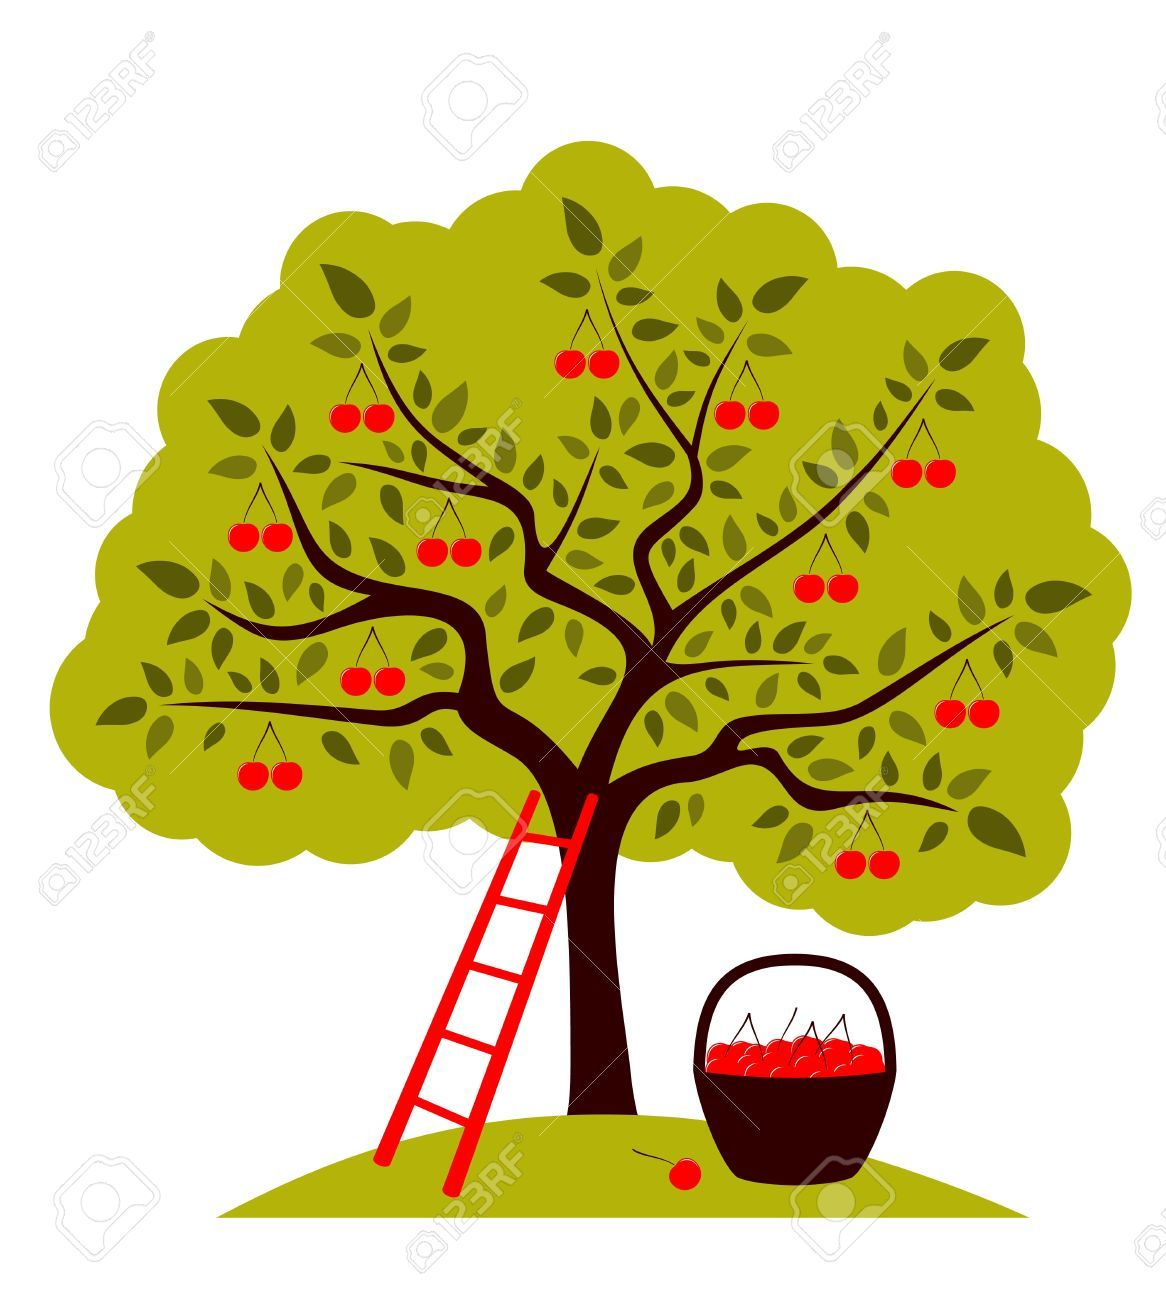 cherry tree drawing - Google Search | Cherry tree art | Pinterest